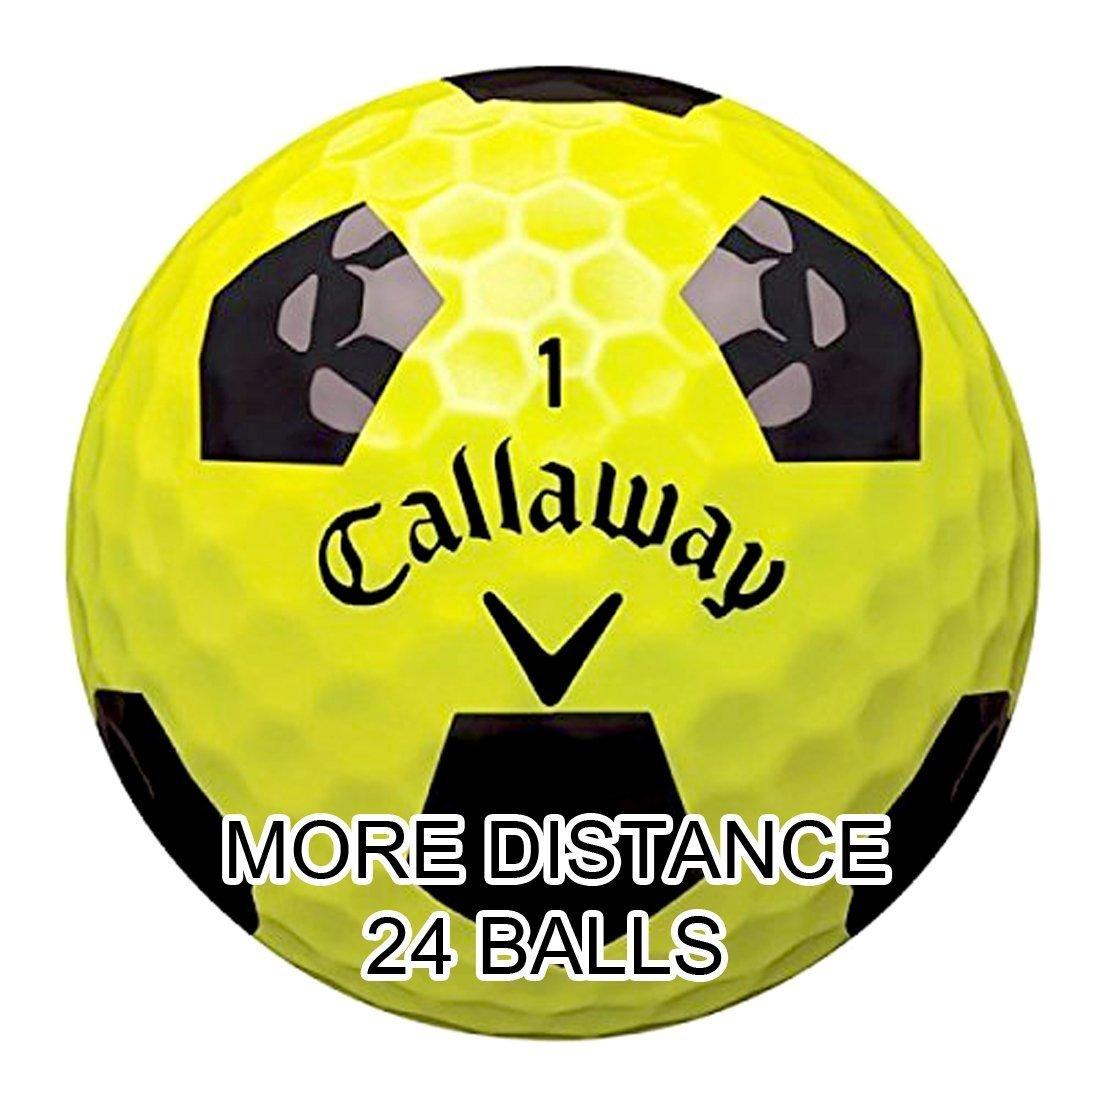 Callaway 2017年モデル クロム製ソフトゴルフボール アメリカ製 (12パック) 色をお選びください B071DWX2N6 Truvis Black on Yellow (2 Dozens)